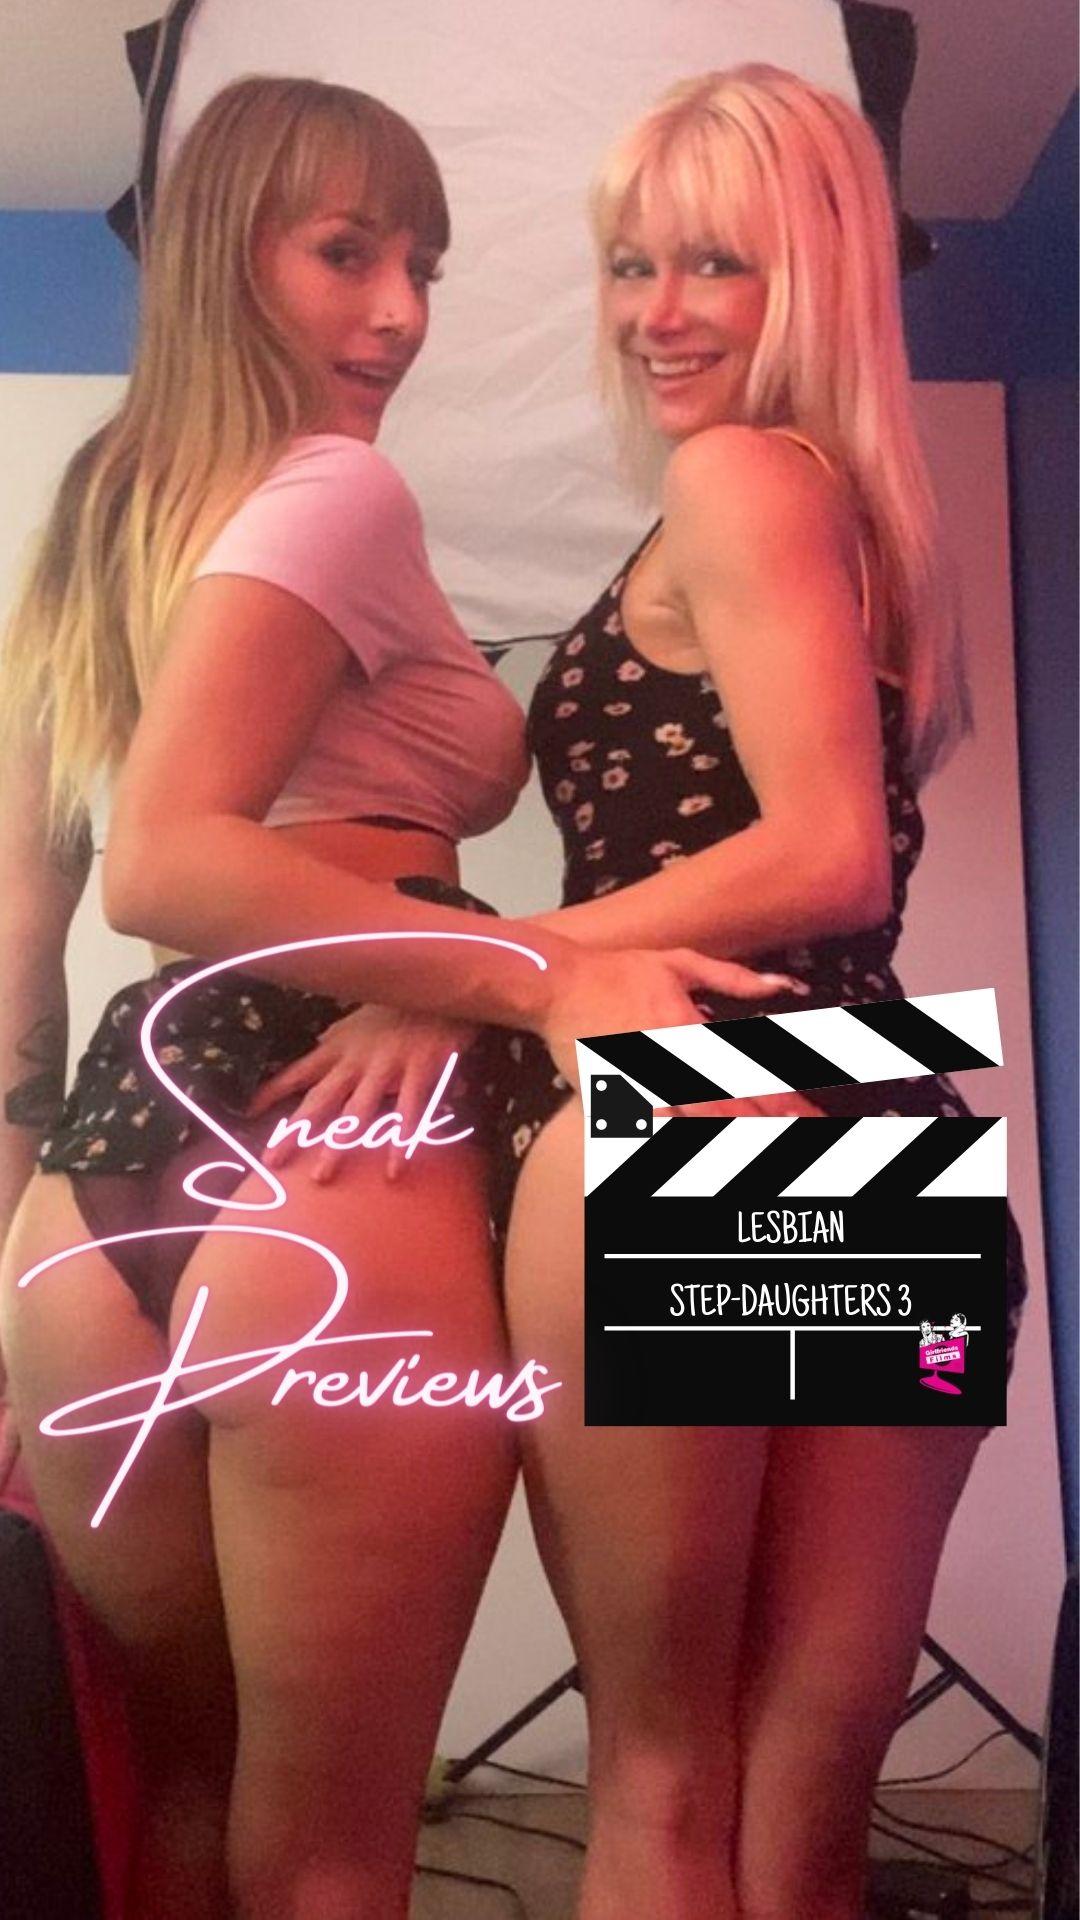 Lesbian Step-Daughters 3 | Girlfriends Films